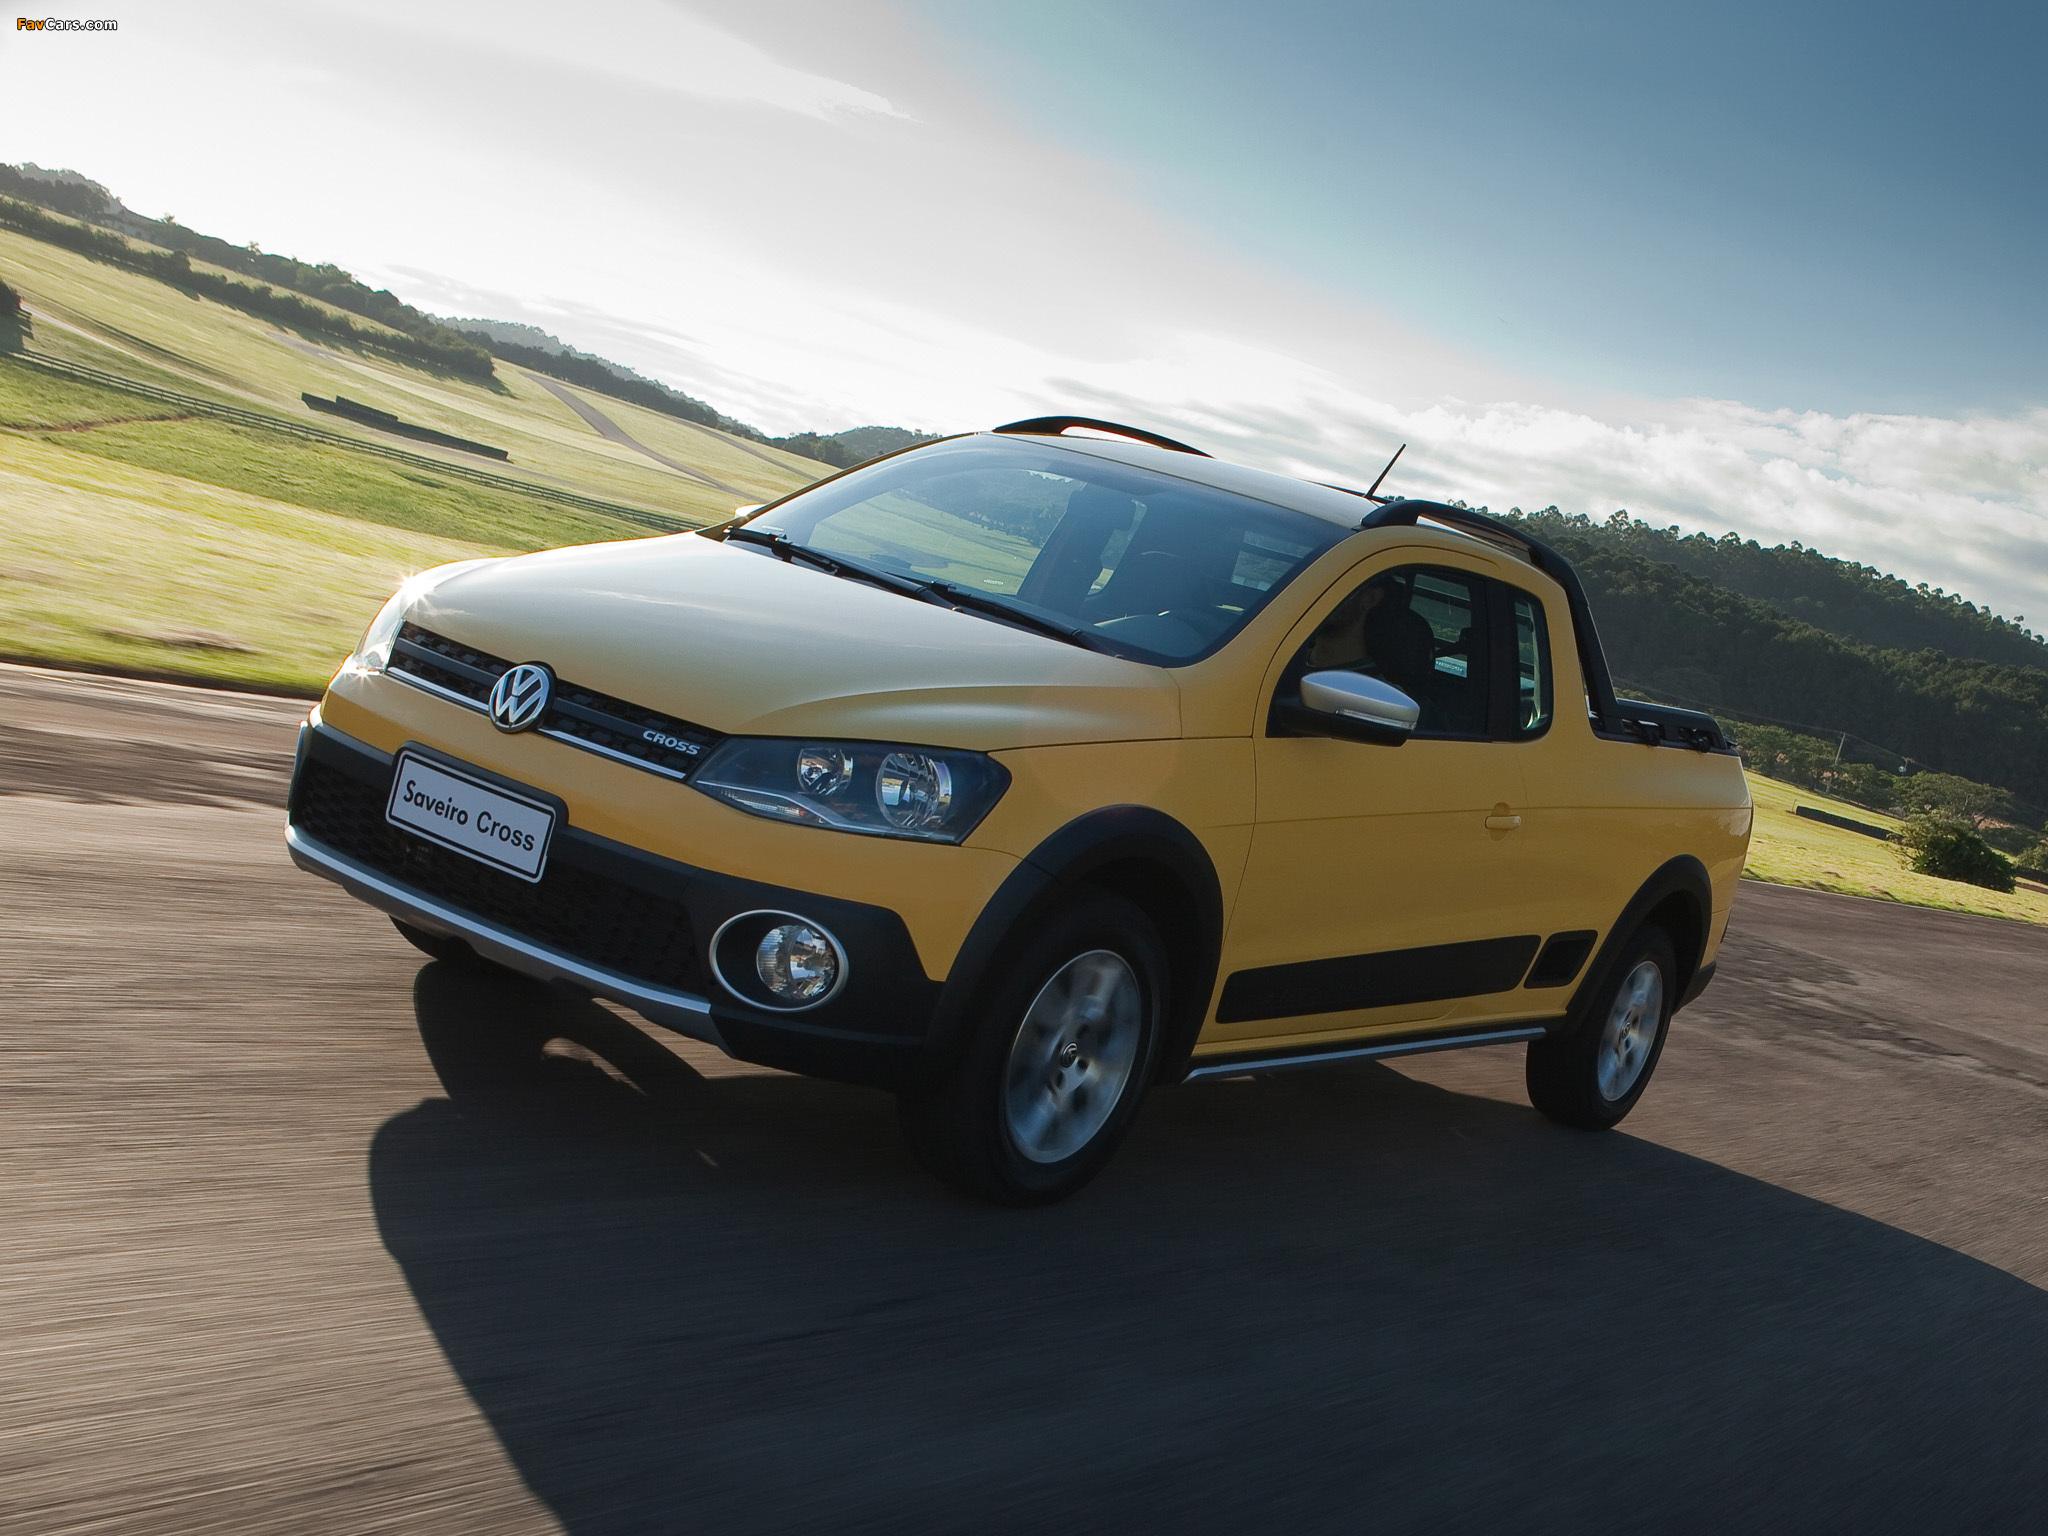 Volkswagen Saveiro Cross (V) 2013 photos (2048 x 1536)